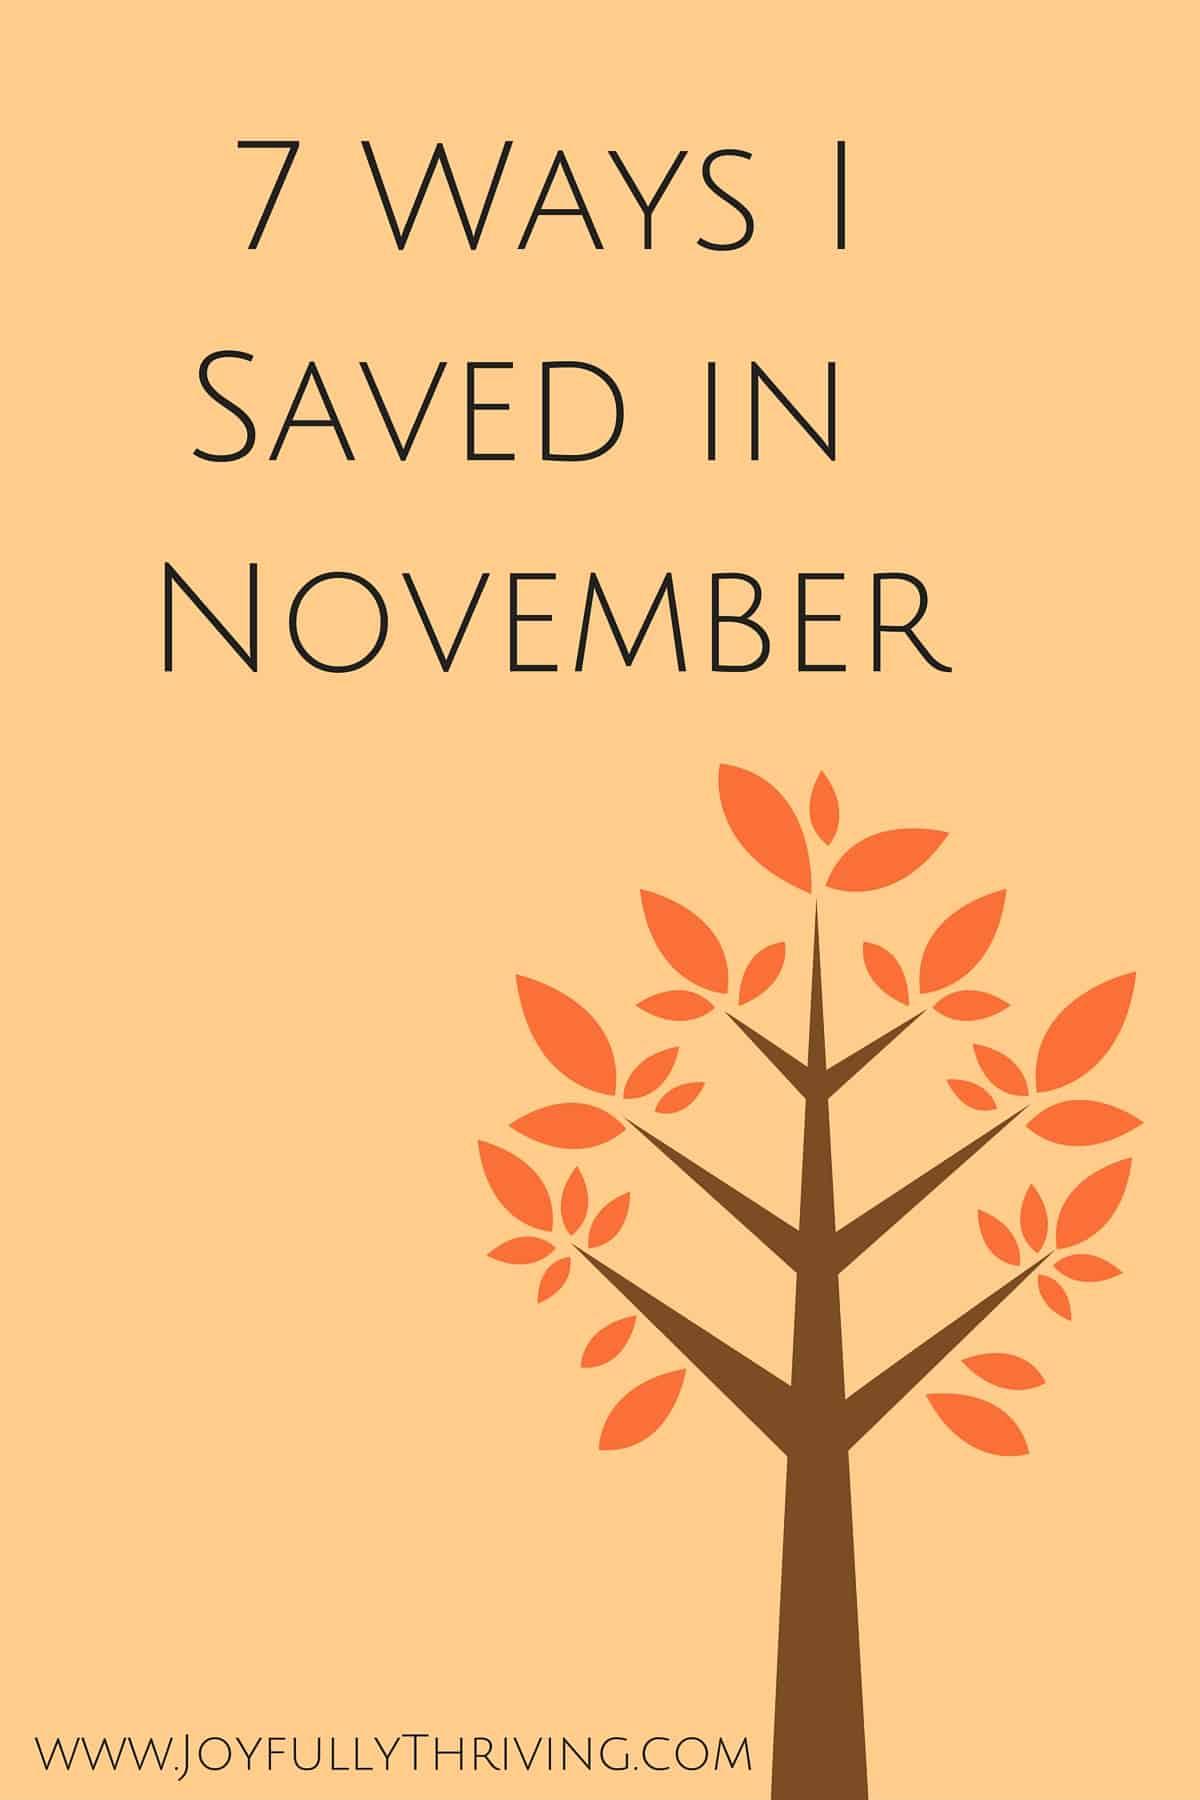 7 Ways I Saved in November